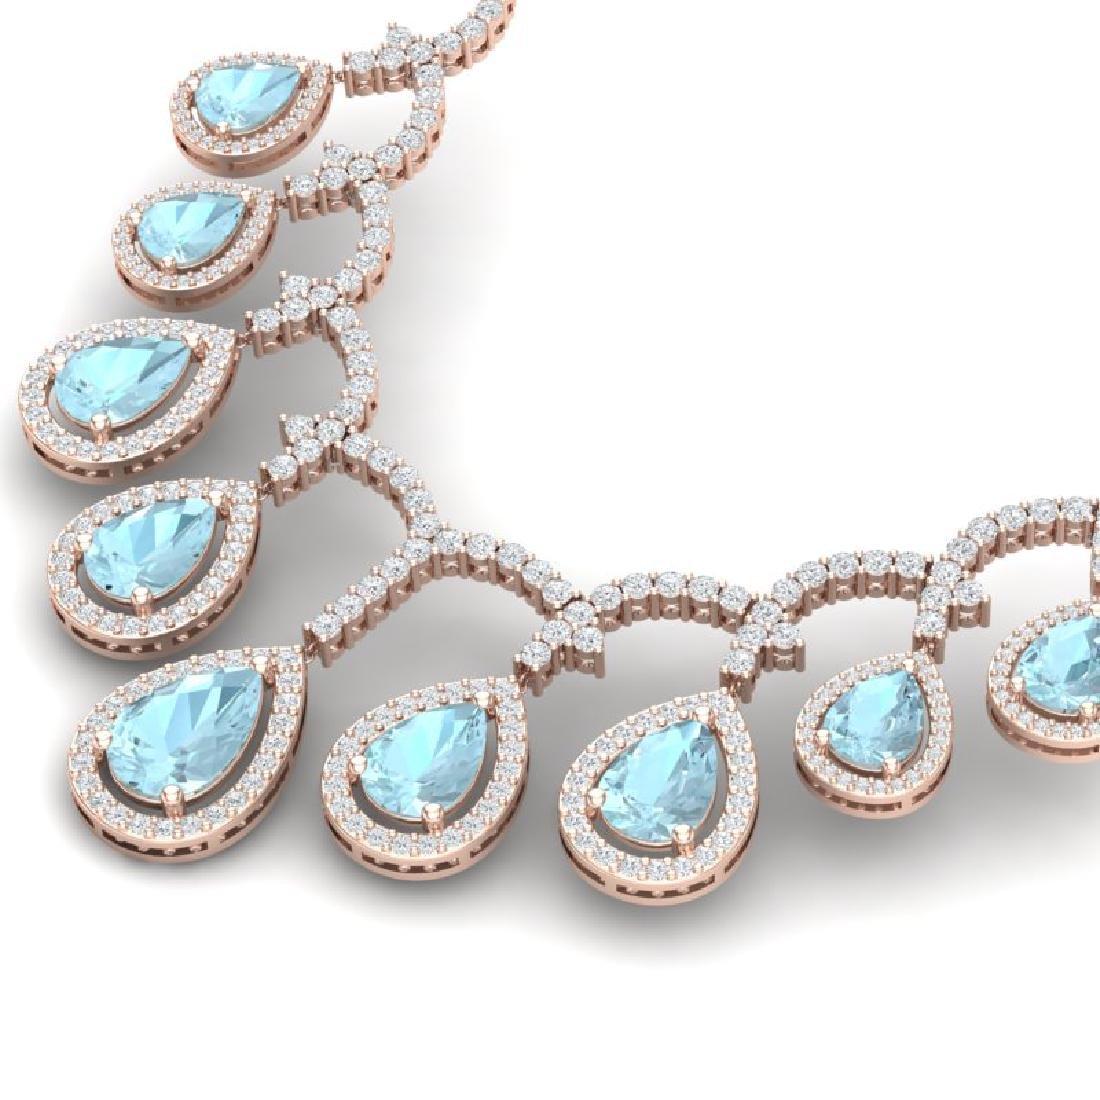 32.62 CTW Royalty Sky Topaz & VS Diamond Necklace 18K - 2